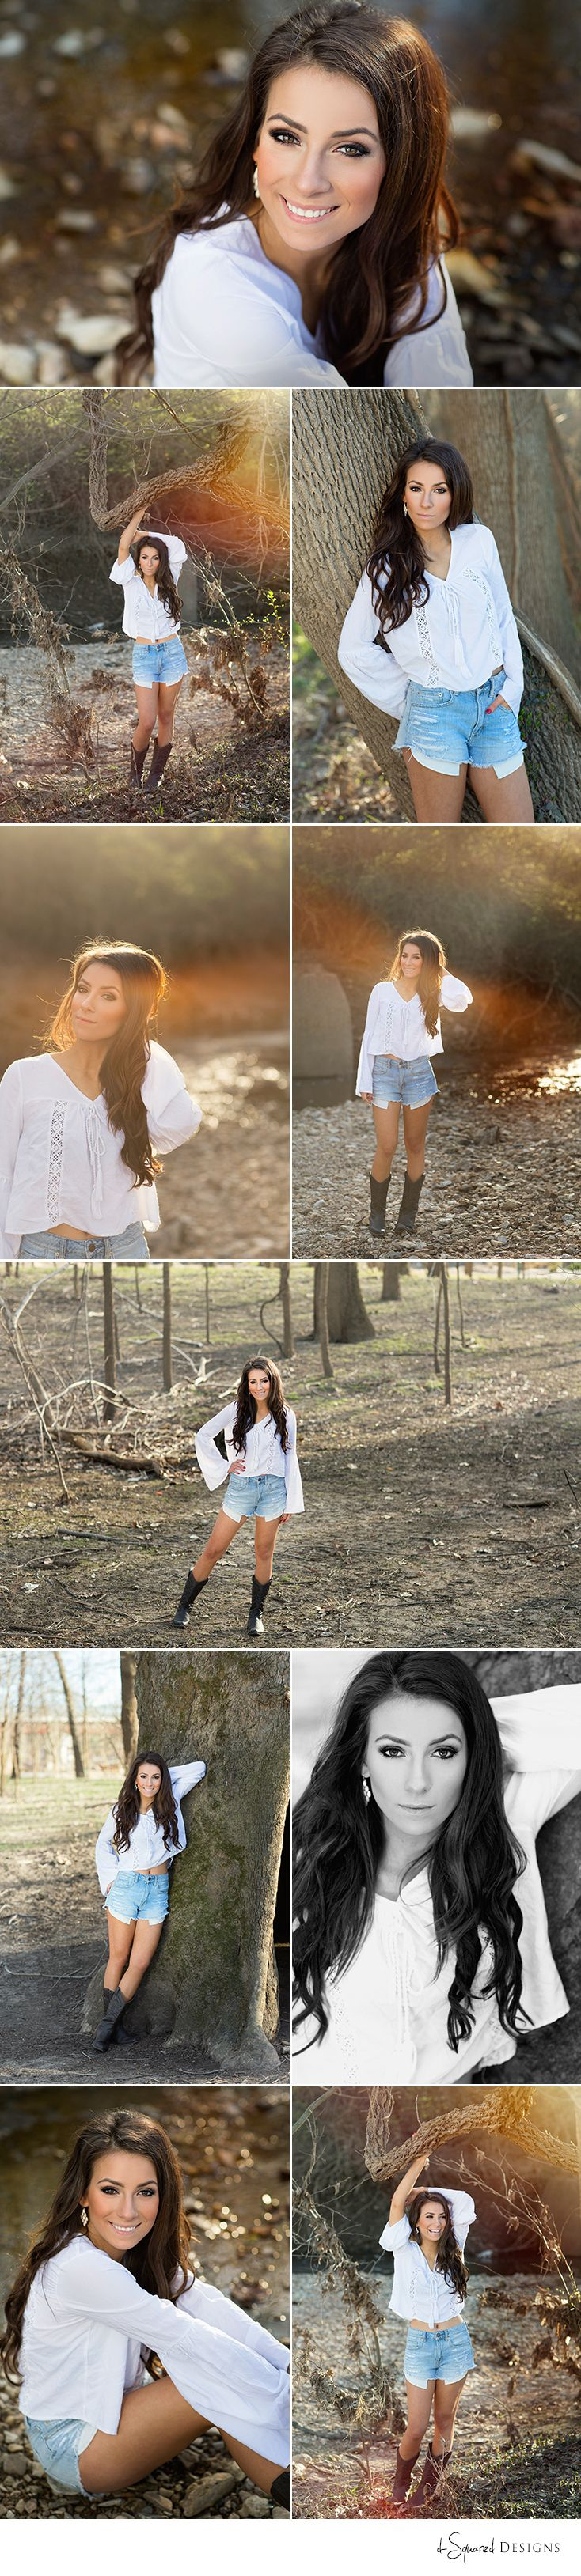 Senior portraits. Senior photography. Spring Senior Session. Gorgeous senior. Woods. River. Creek. d-Squared Designs St. Louis, MO Senior Photography